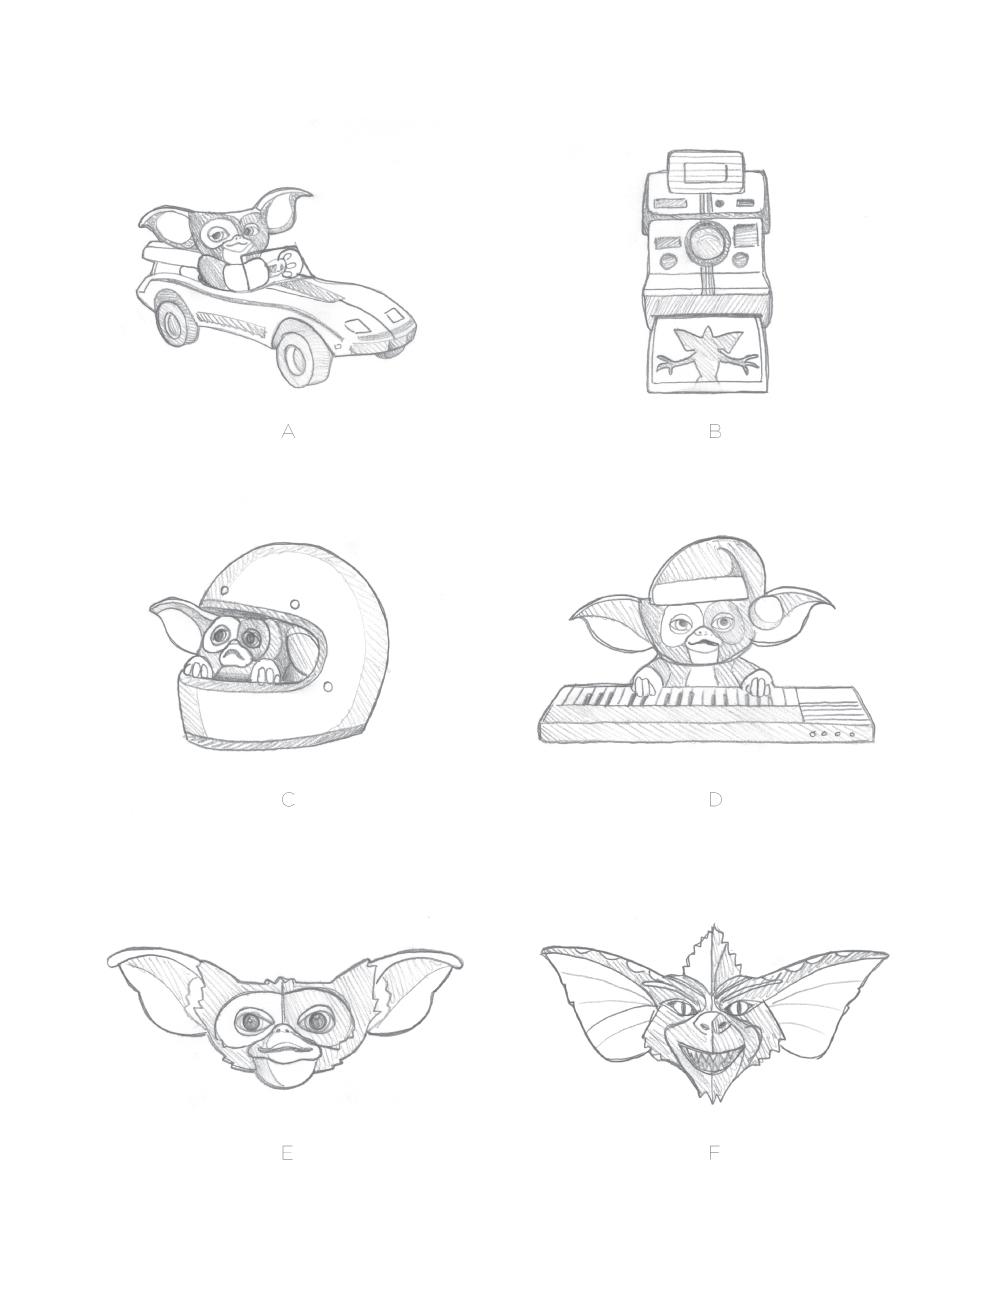 gremlins_pins_concepts.jpg